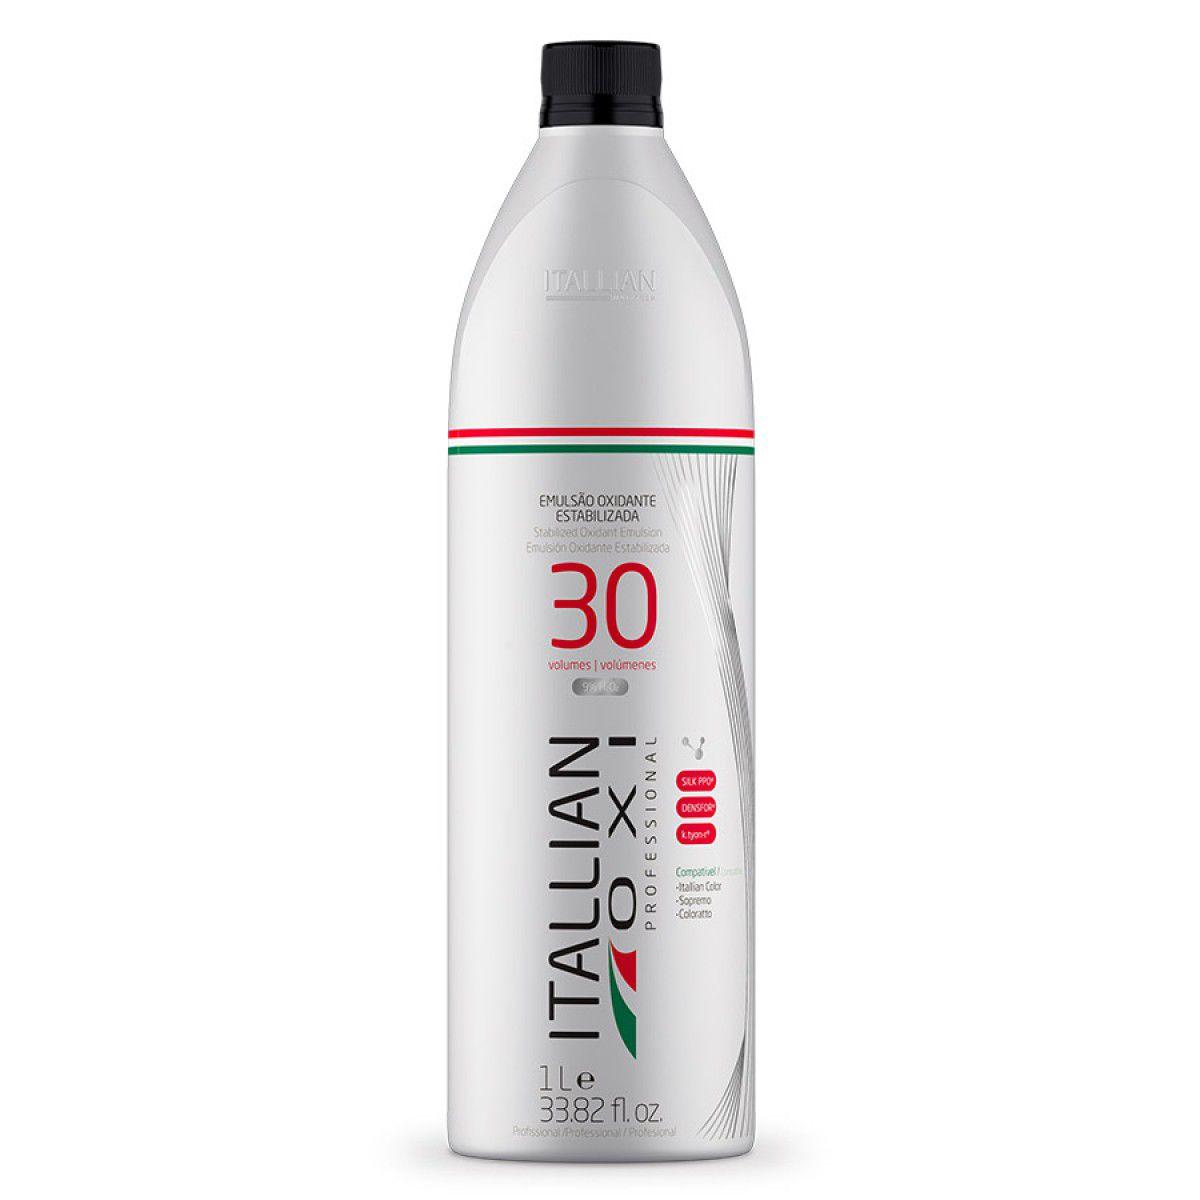 Kit Pó Descolorante Profissional Dust Free Itallian Color + Ox 30 Vol